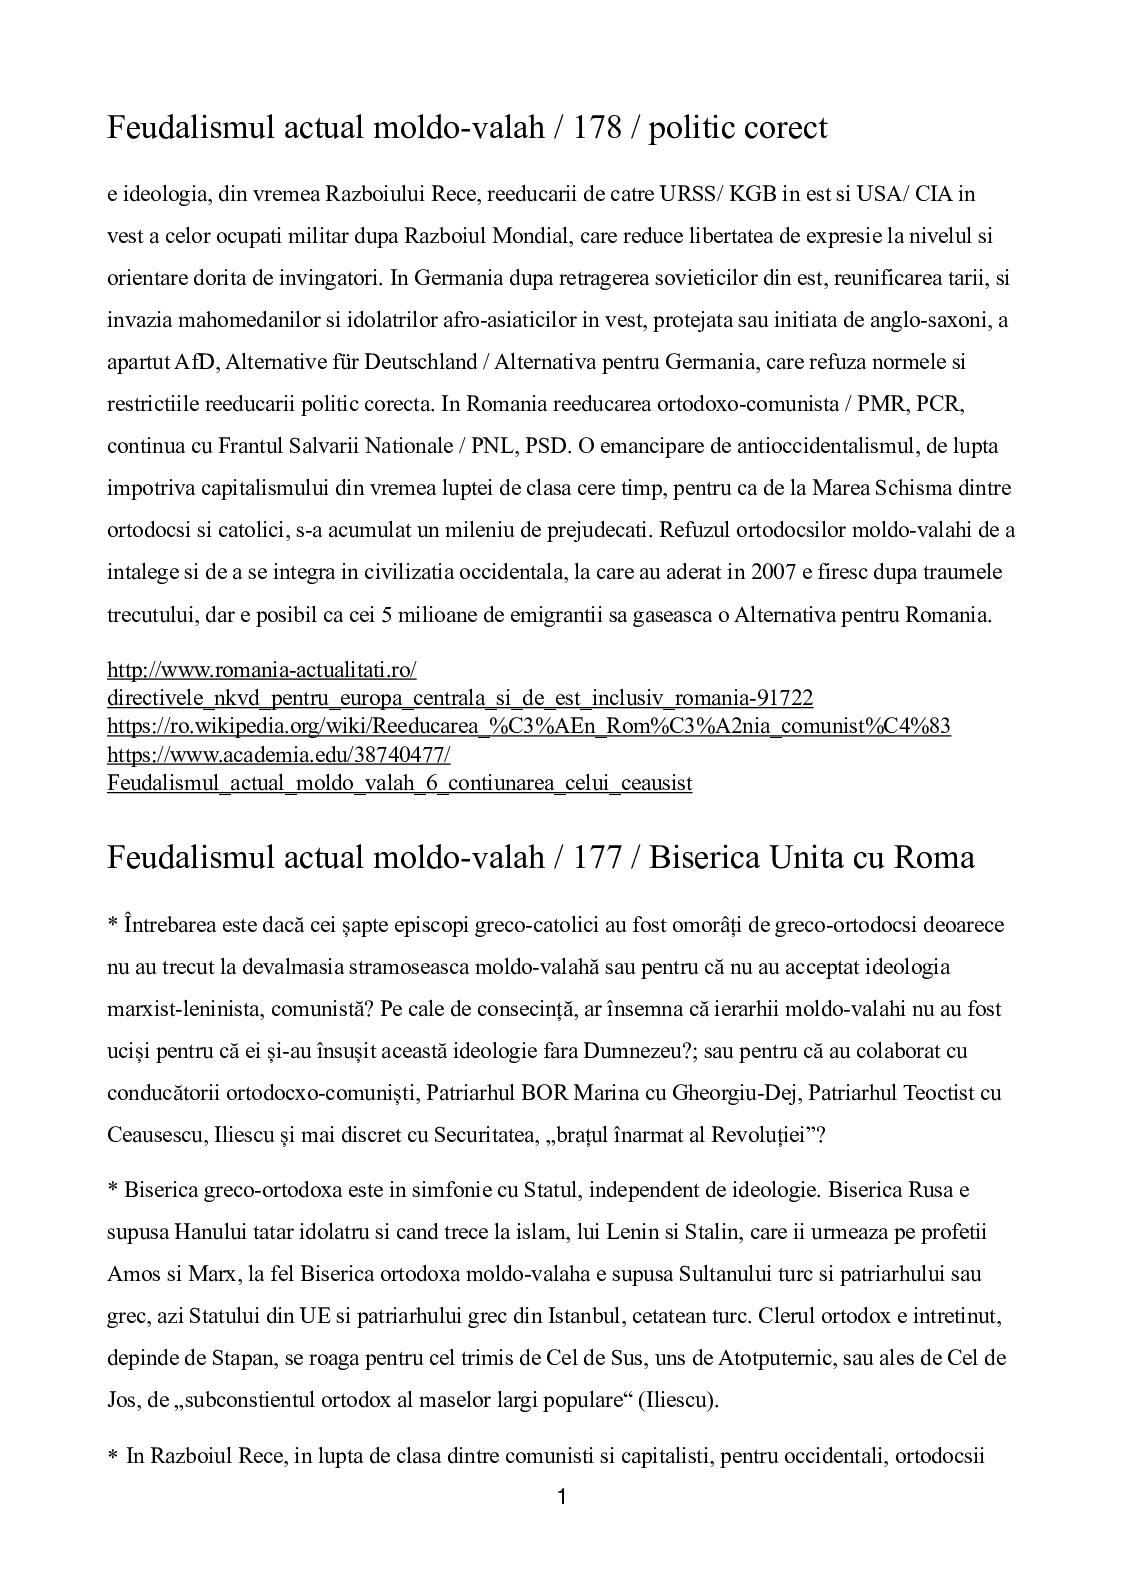 Aplicația De Cazino Cu Bani Reali - Cele 5 cazinouri online românești - BODY IQ